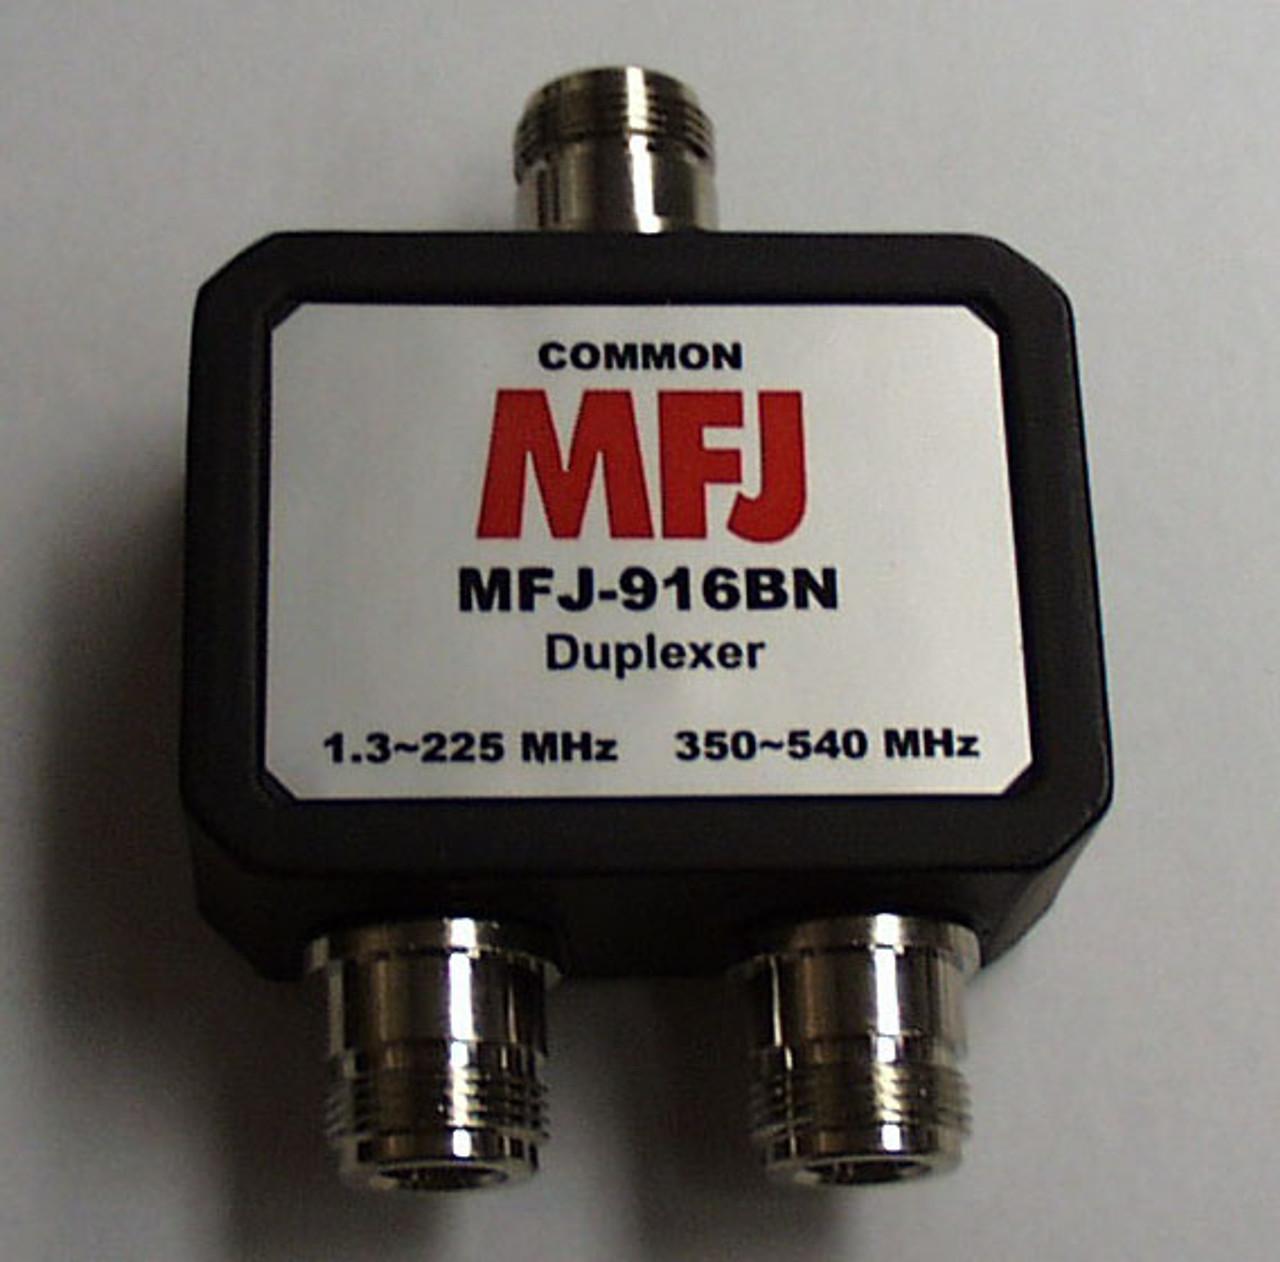 MFJ-916BN, 1.8-225 MHZ, 350-540 MHZ DUPLEXER, N FEMALE